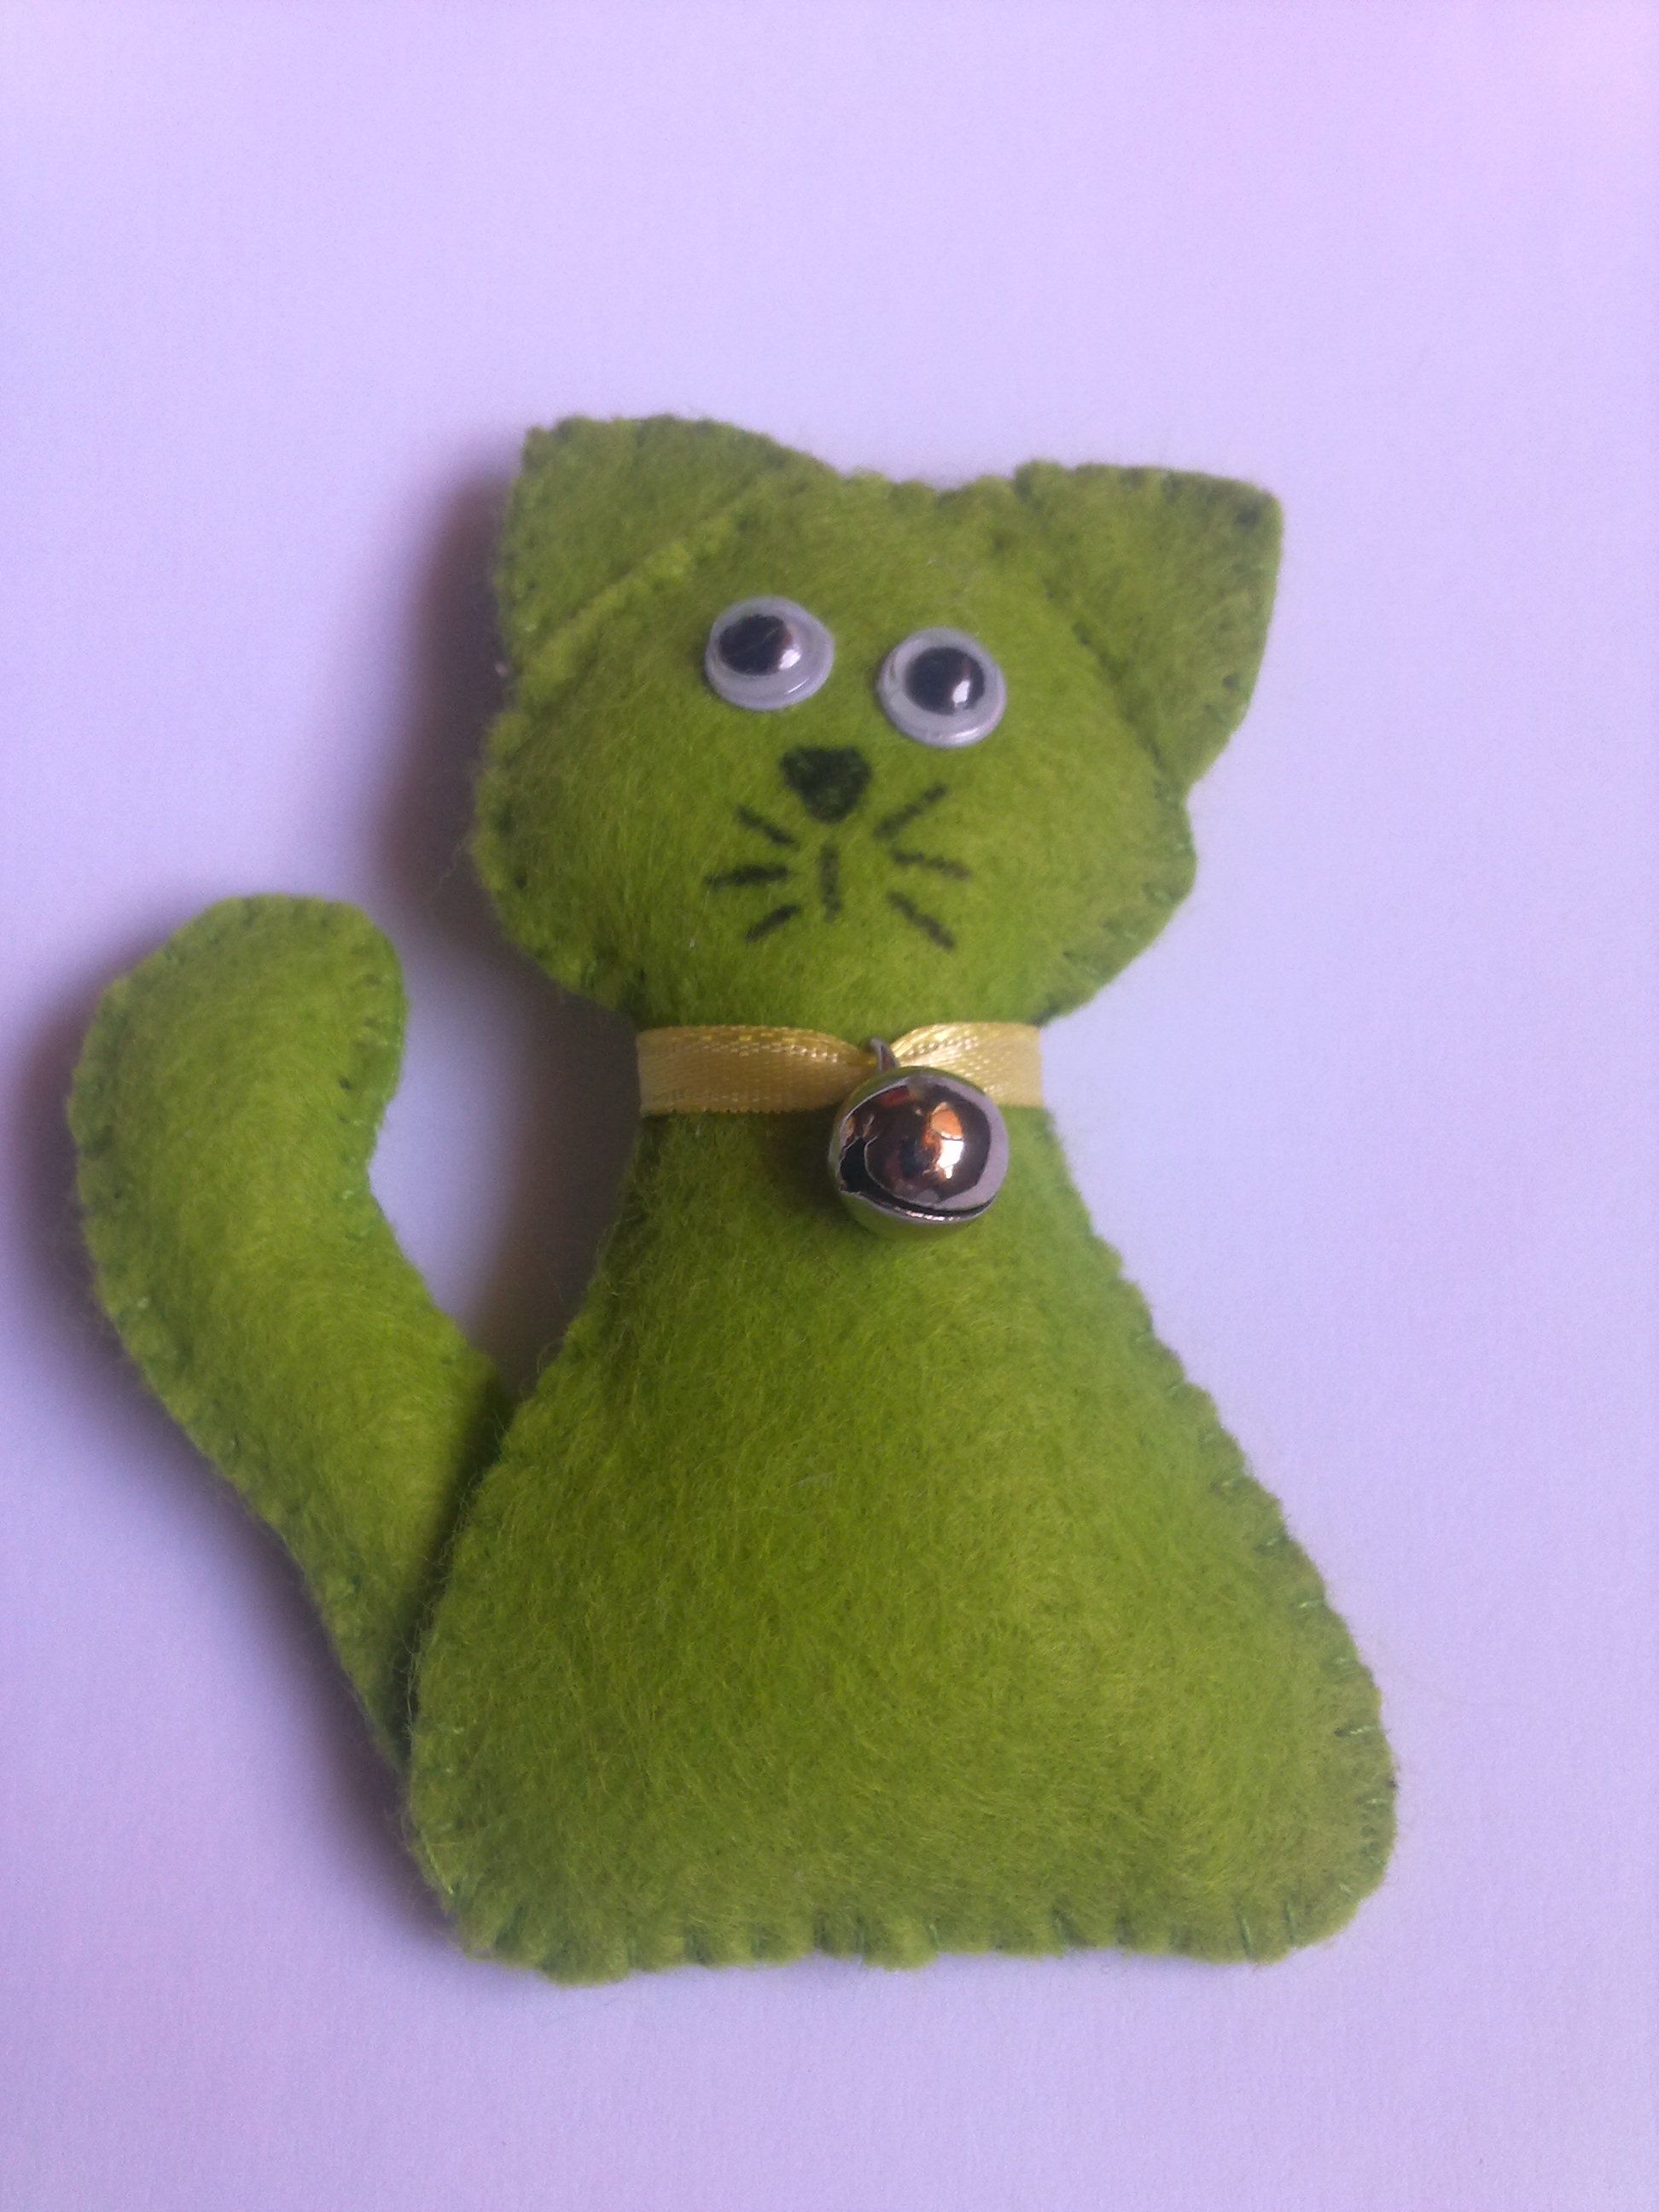 Broche de gatito en fieltro con cascabel.